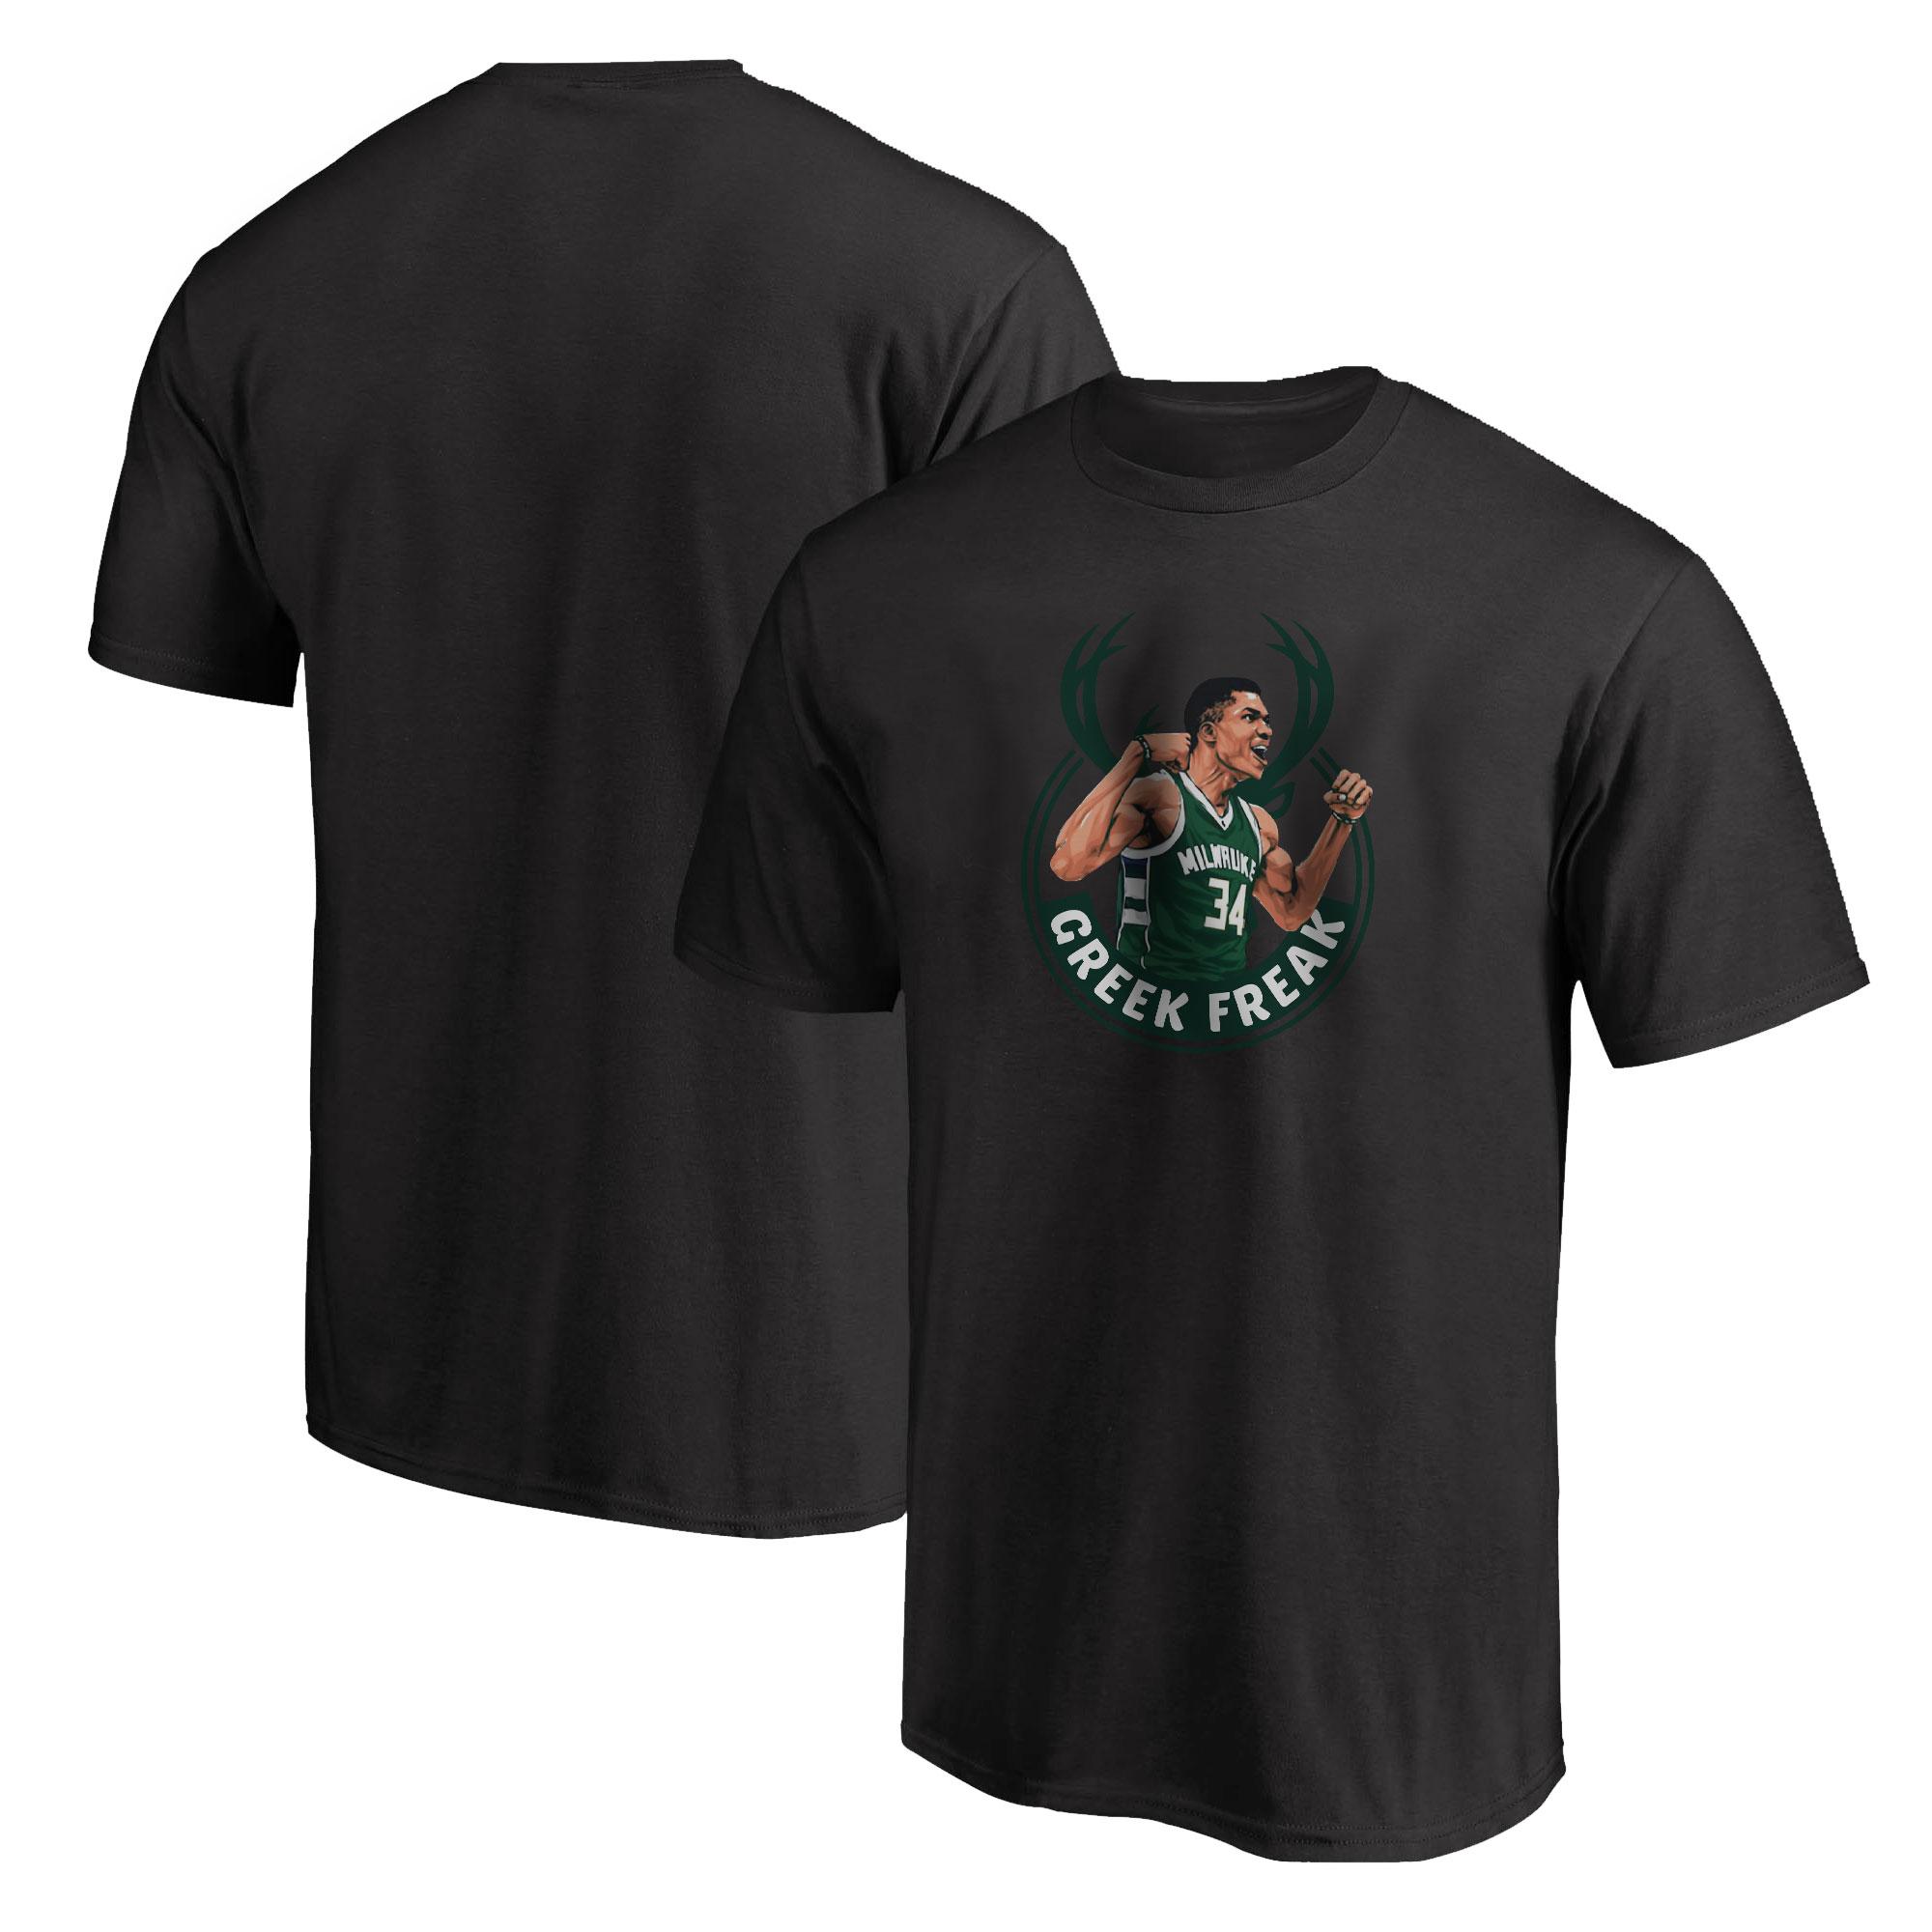 Milwaukee Bucks Greek Freak Tshirt (TSH-BLC-405.greekfreak-new)